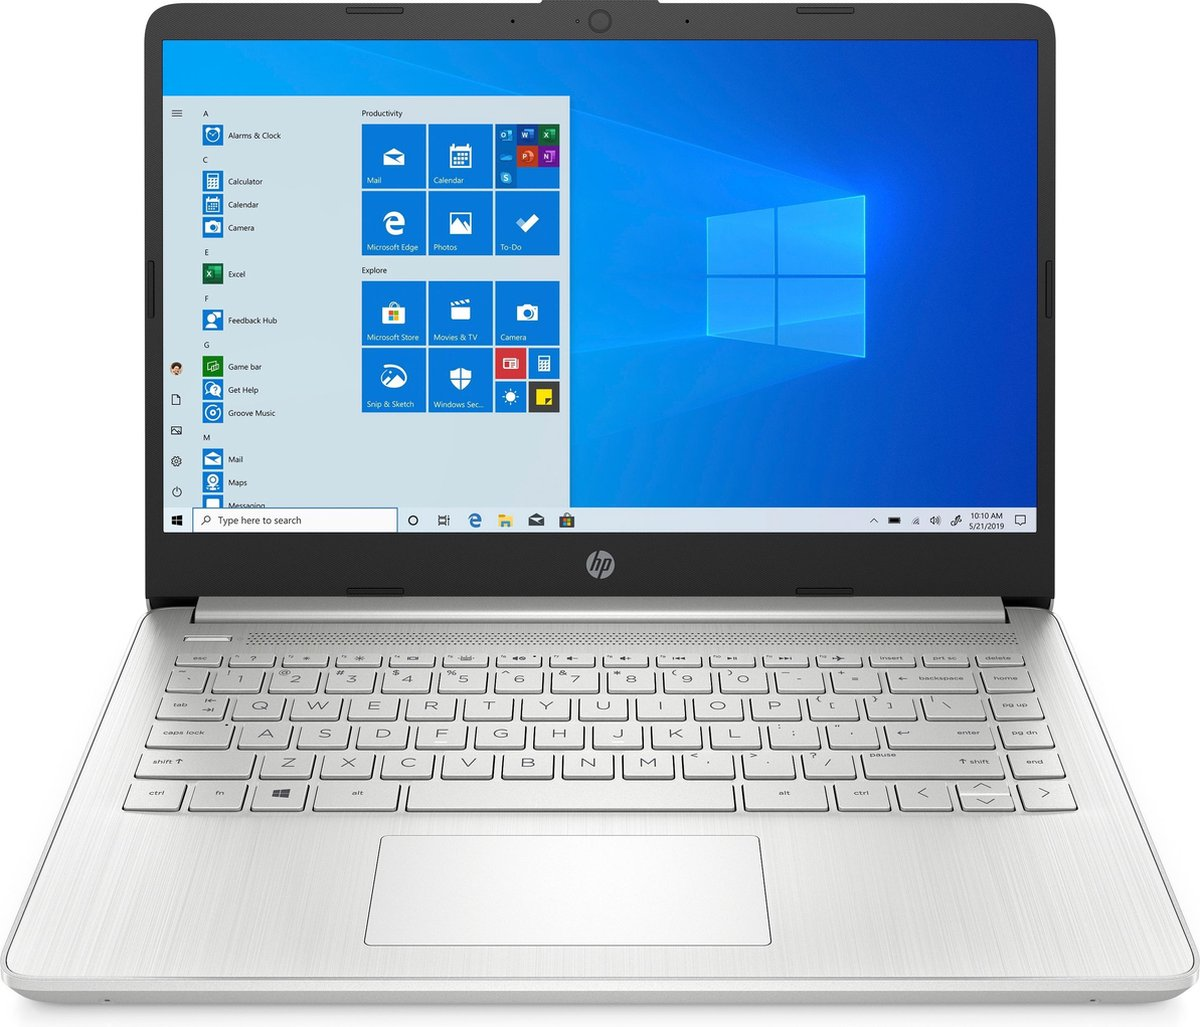 "HP 14s-dq2111nd DDR4-SDRAM Notebook 35,6 cm (14"") 1920 x 1080 Pixels Intel® 11de generatie Core™ i3 4 GB 128 GB SSD Wi-Fi 5 (802.11ac) Windows 10 Home S Zilver"